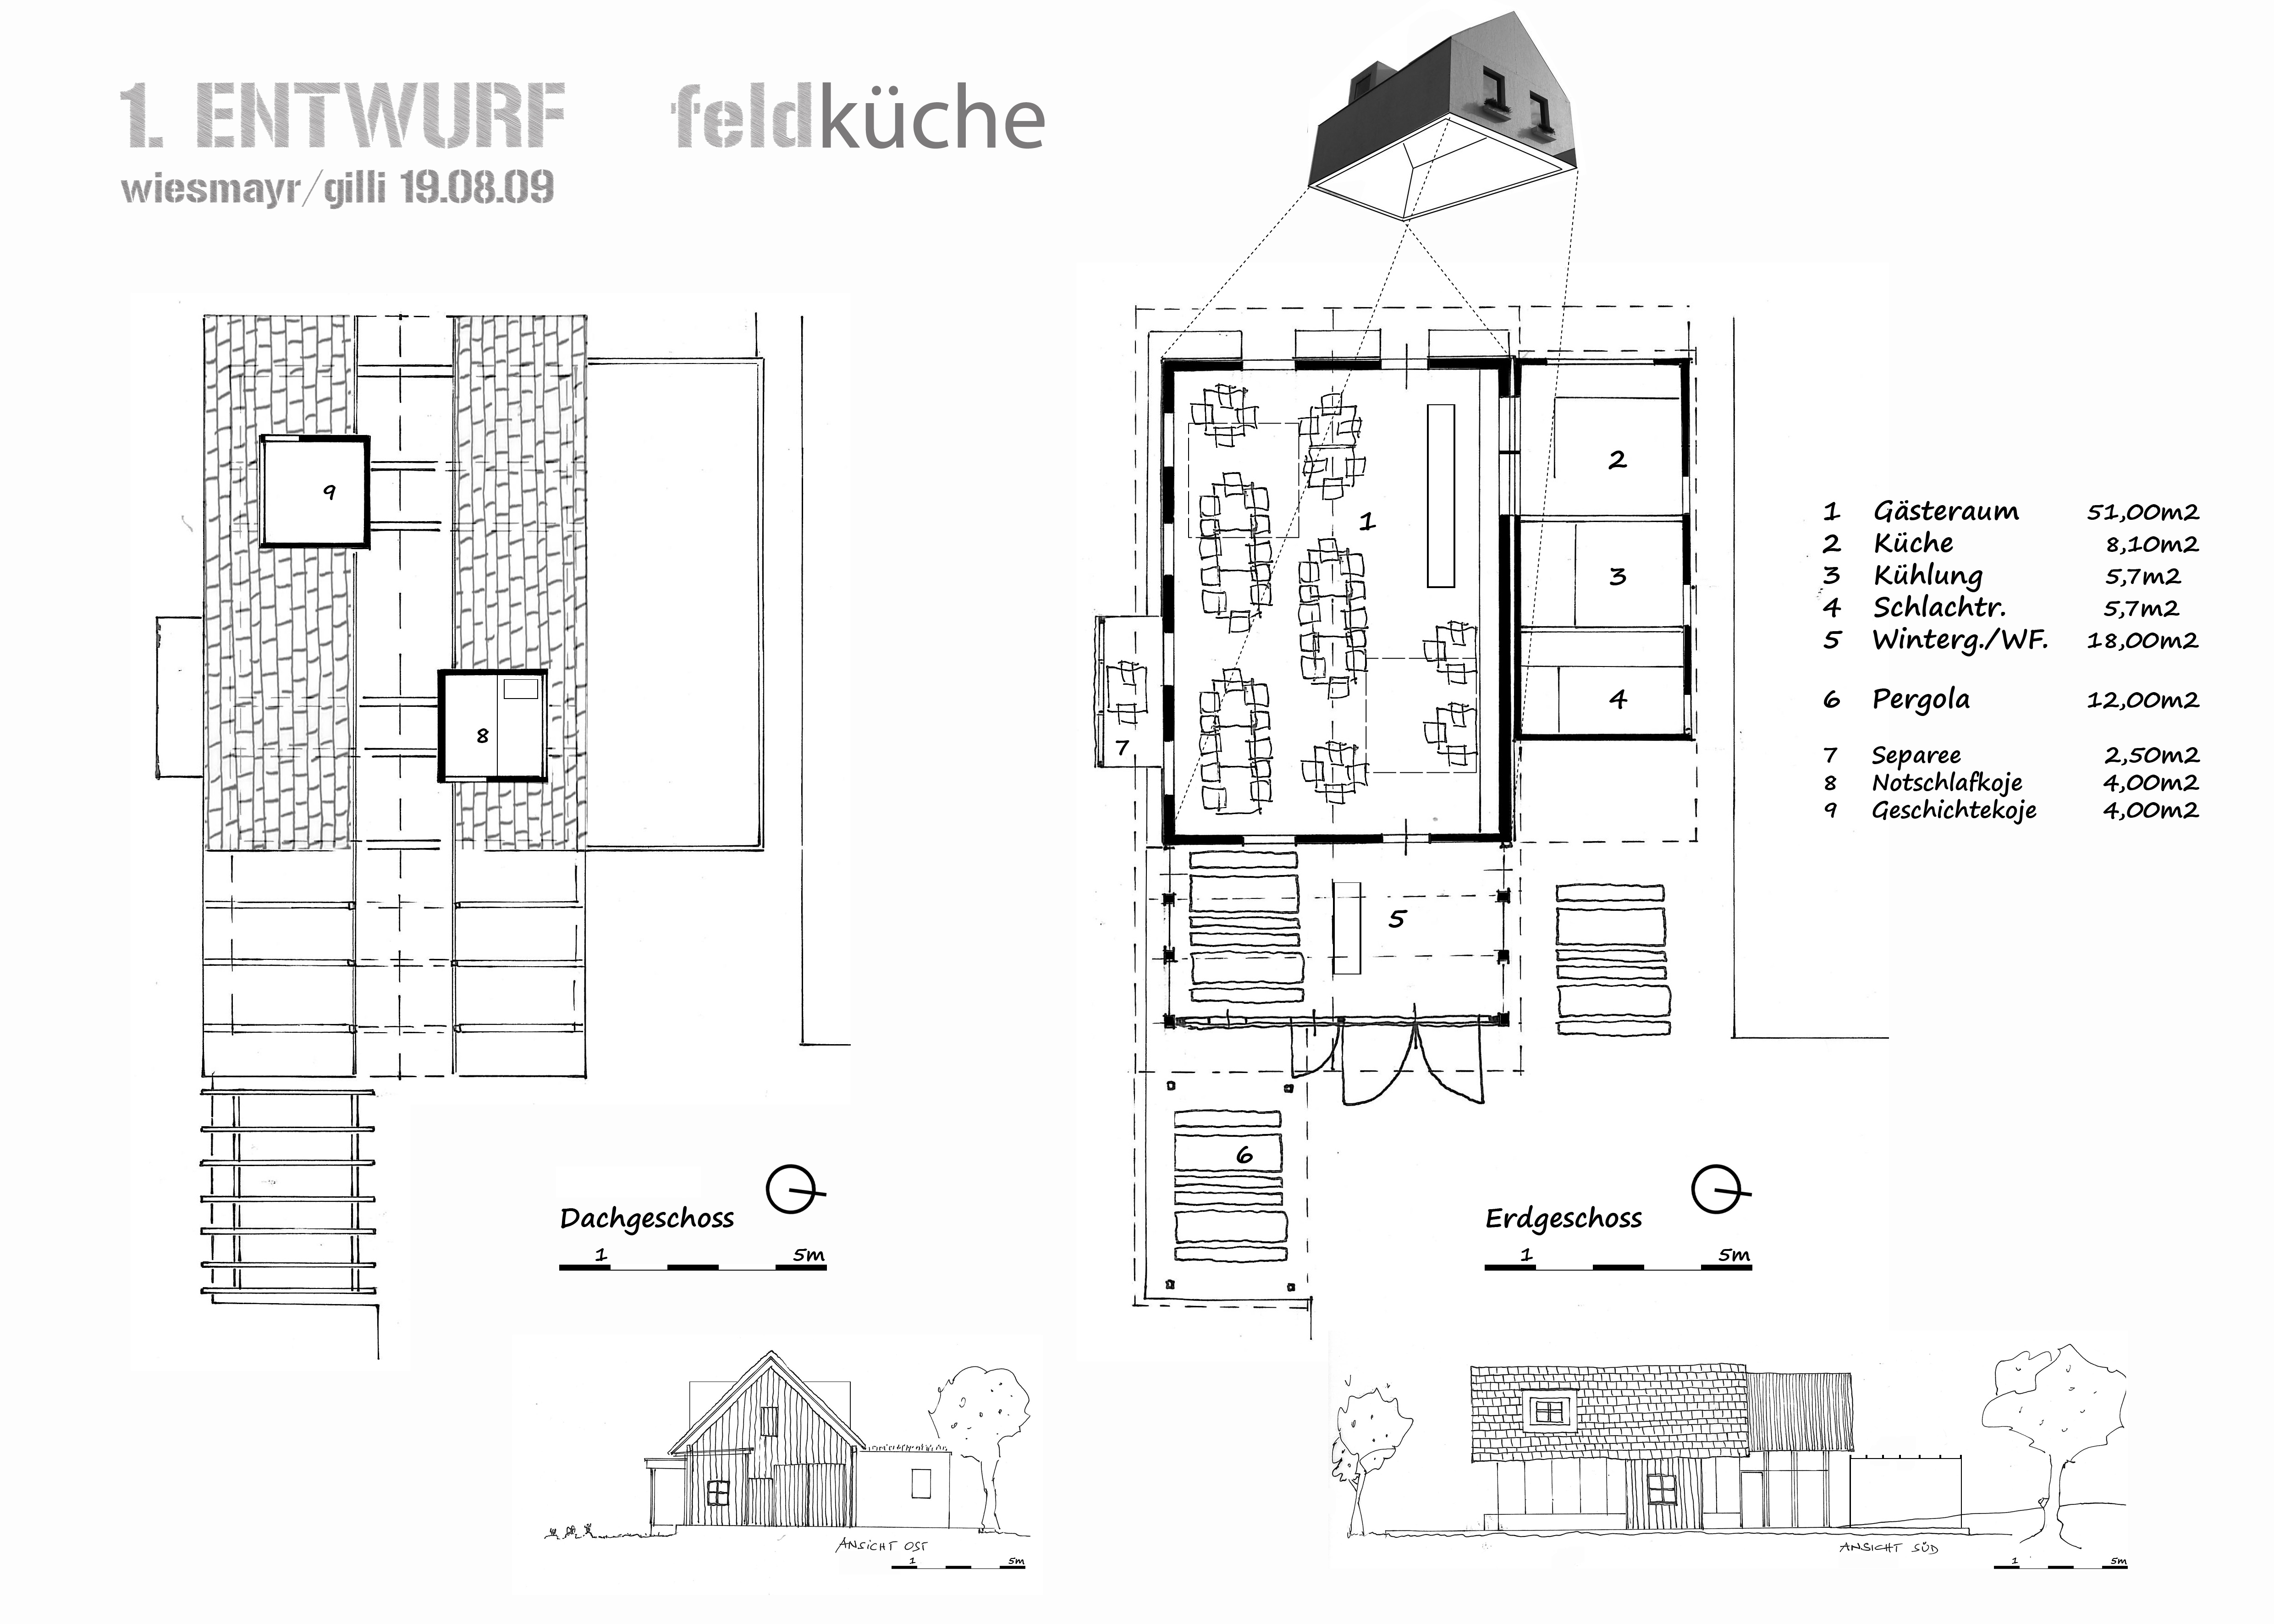 090818_entwurf_feldküche1